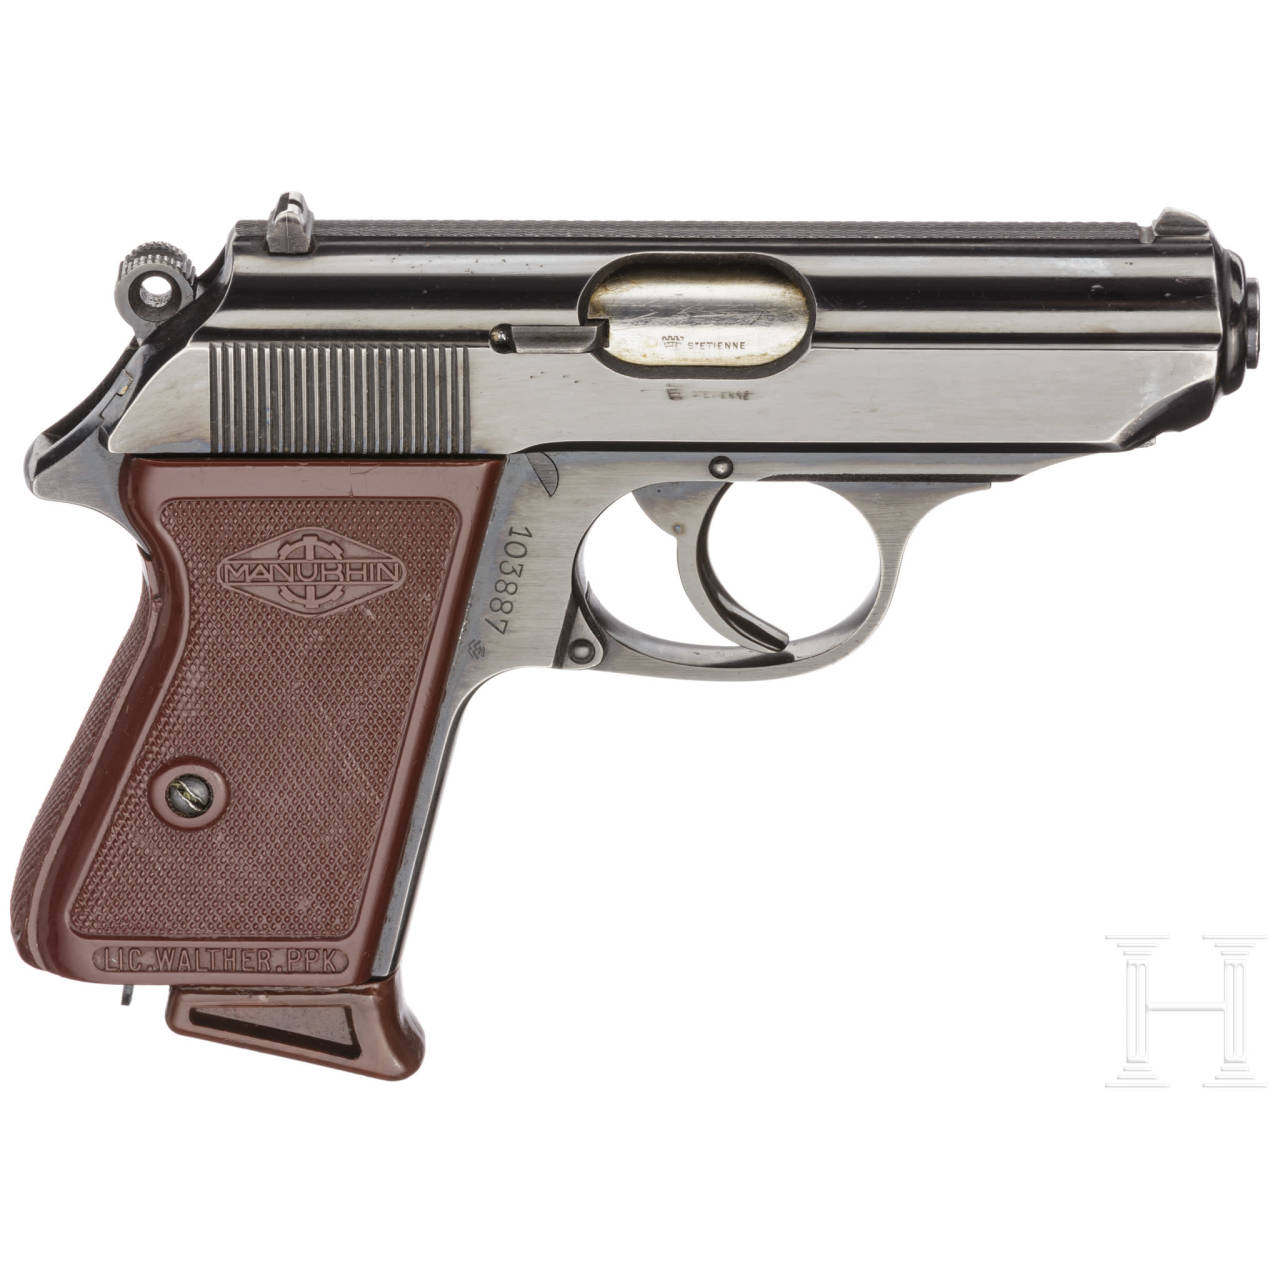 Walther-Manurhin PPK, Zoll, im Karton